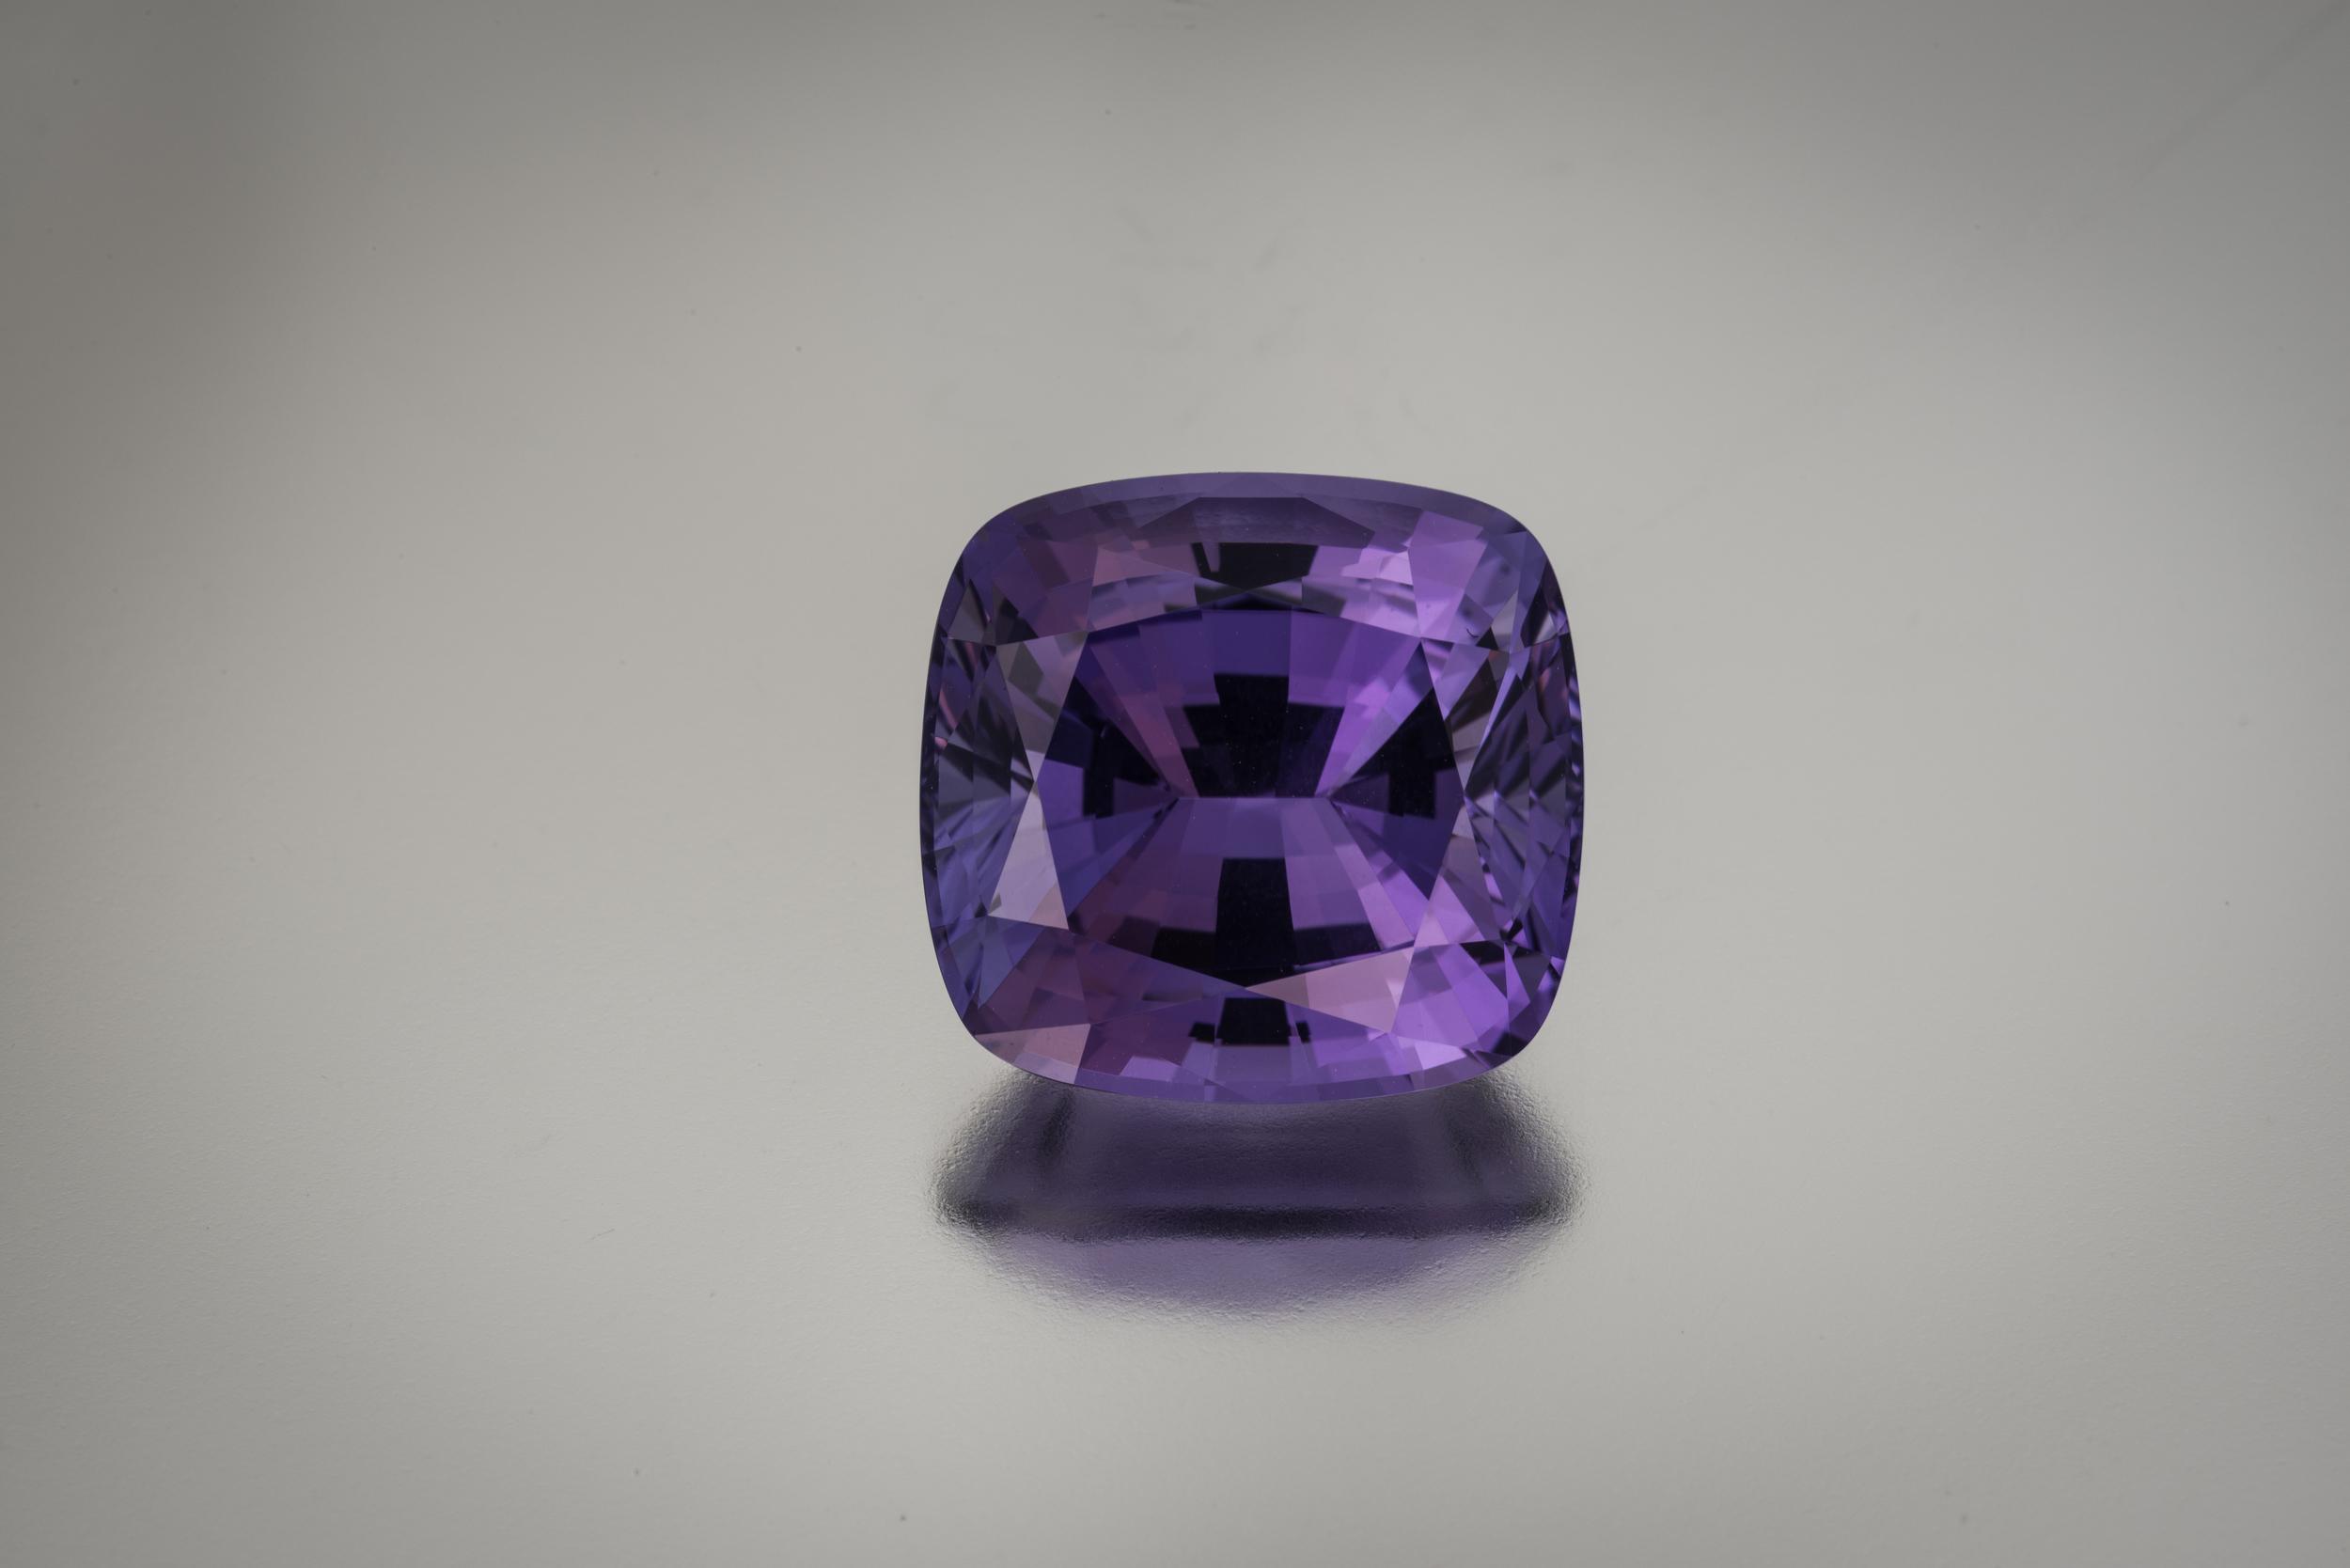 Purple tanzanite , 21.79 carats, 16.8 x 16 x 1.05 mm. (Photo: Mia Dixon)